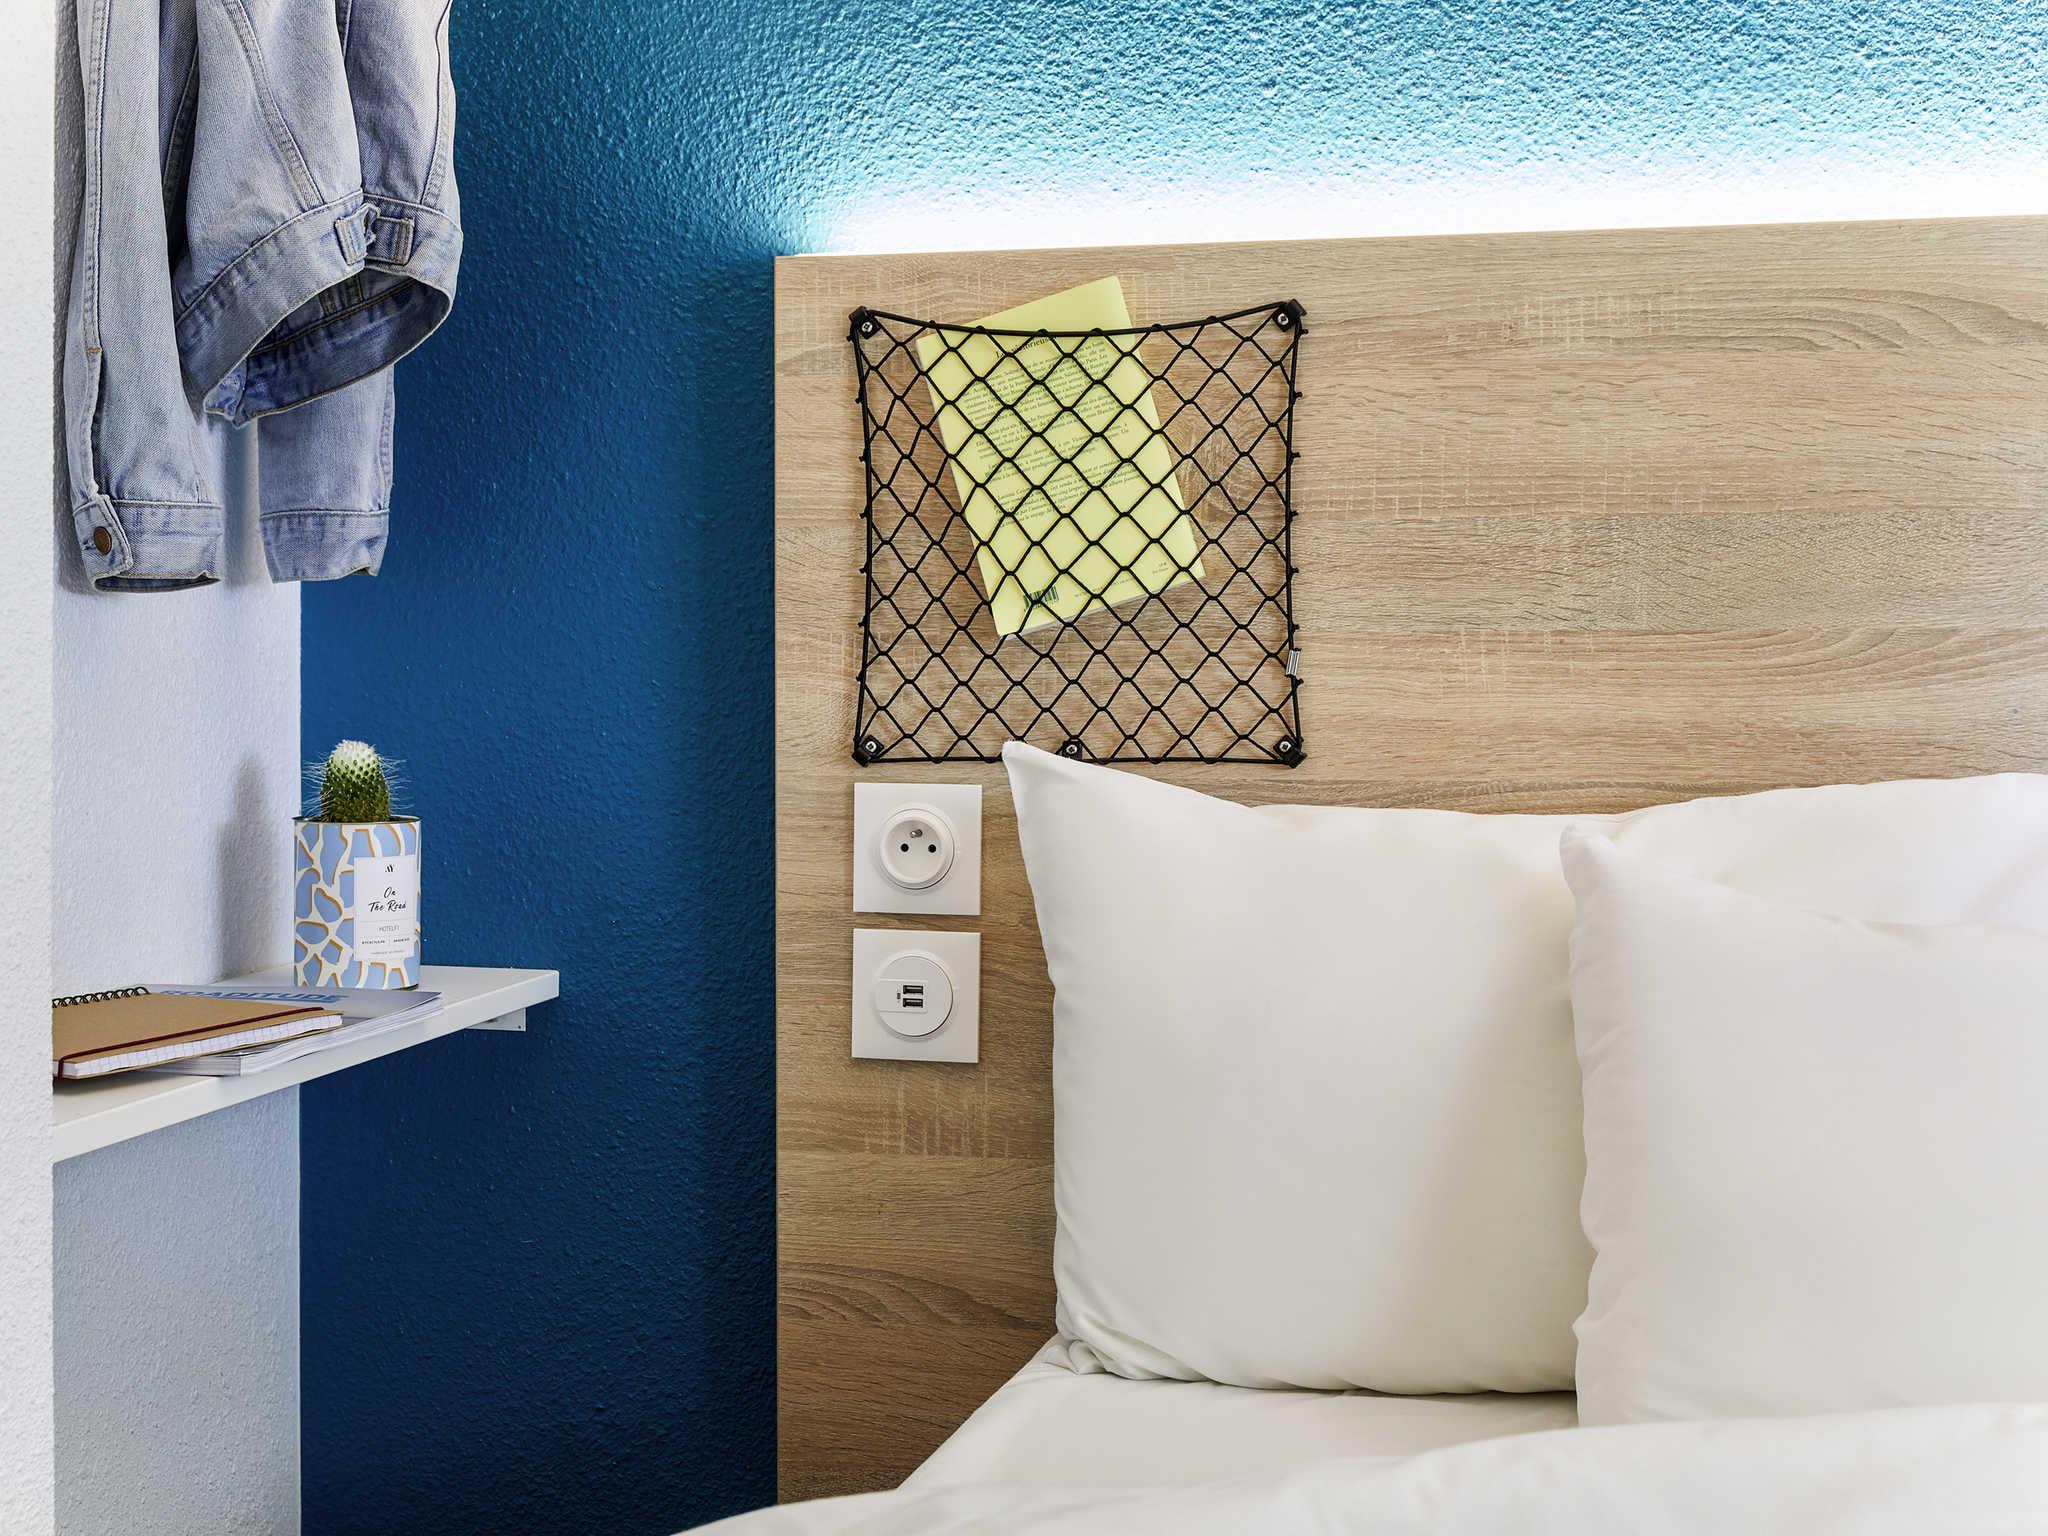 Otel – hotelF1 Roissy Aéroport CDG PN 2